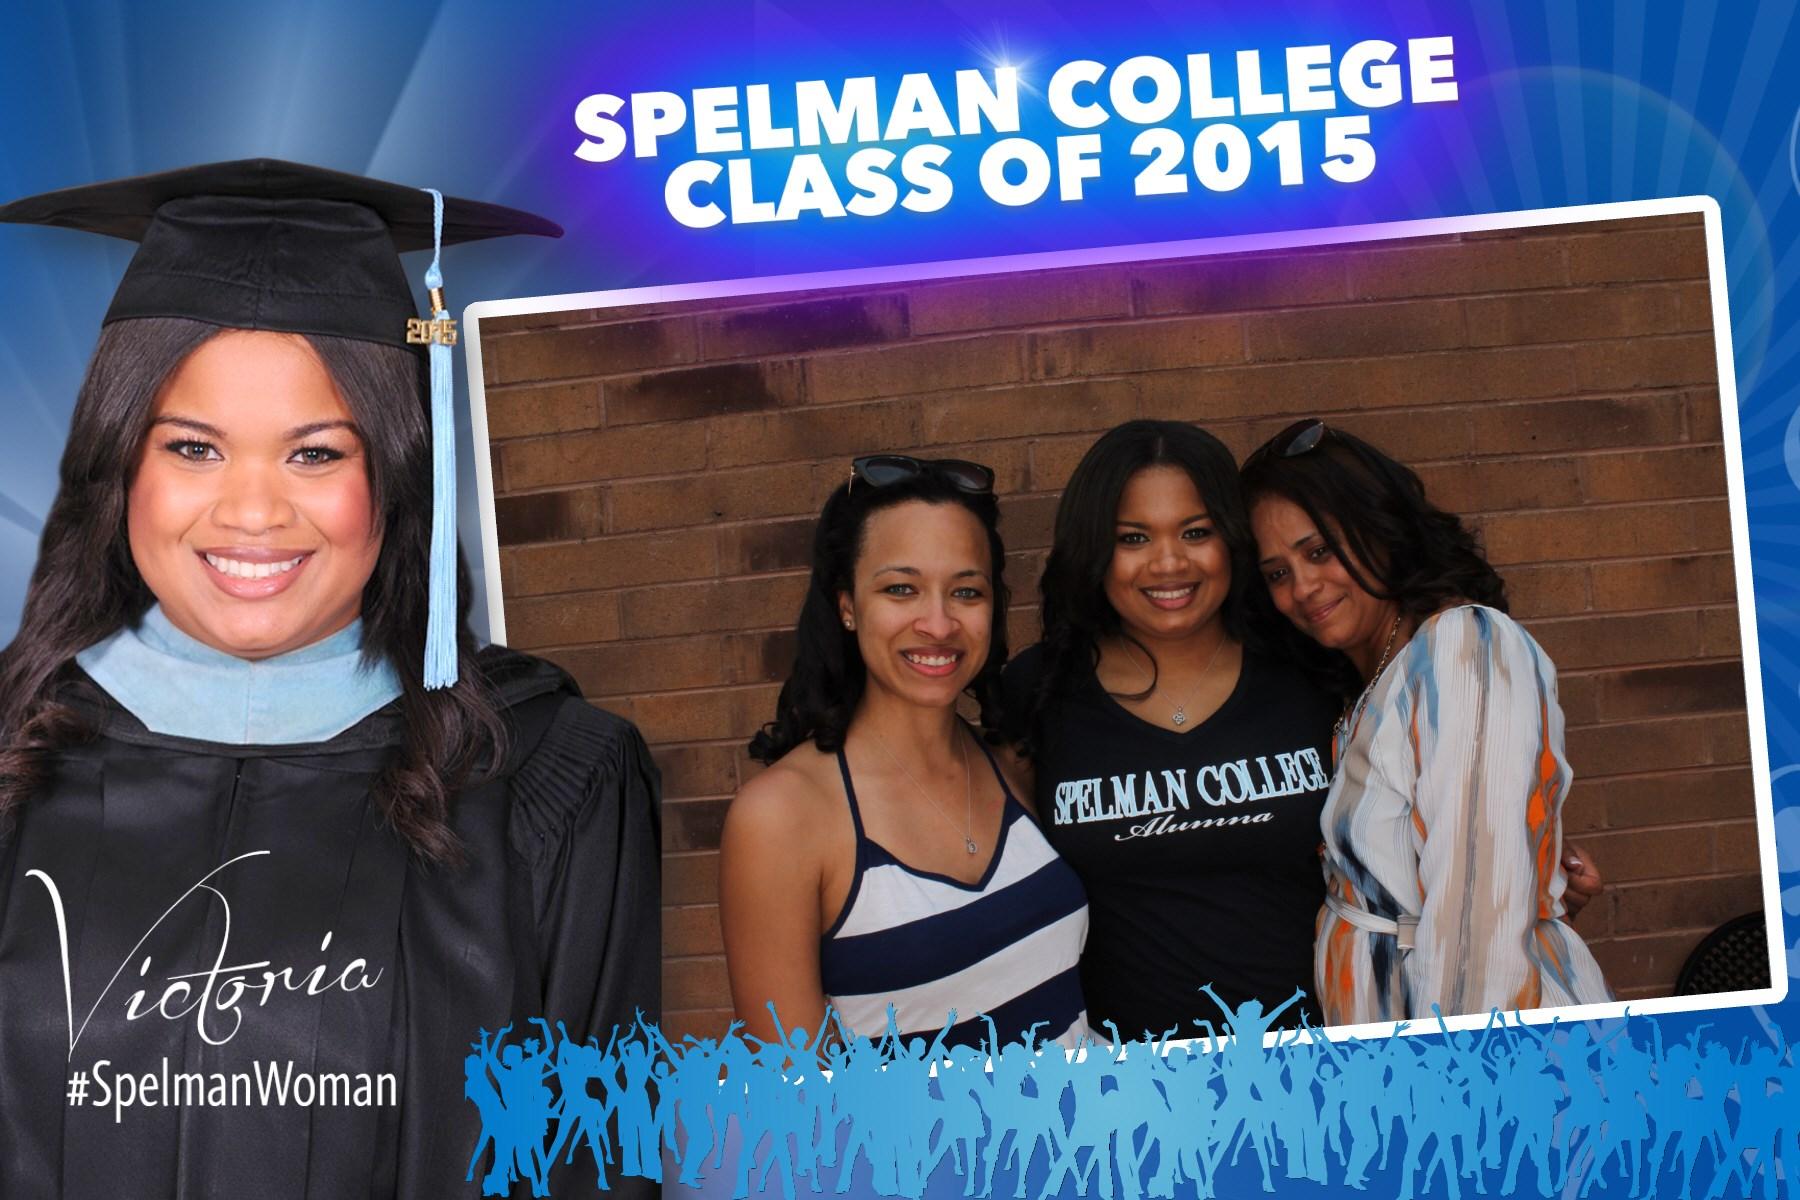 Atlanta Graduation Photo Booth